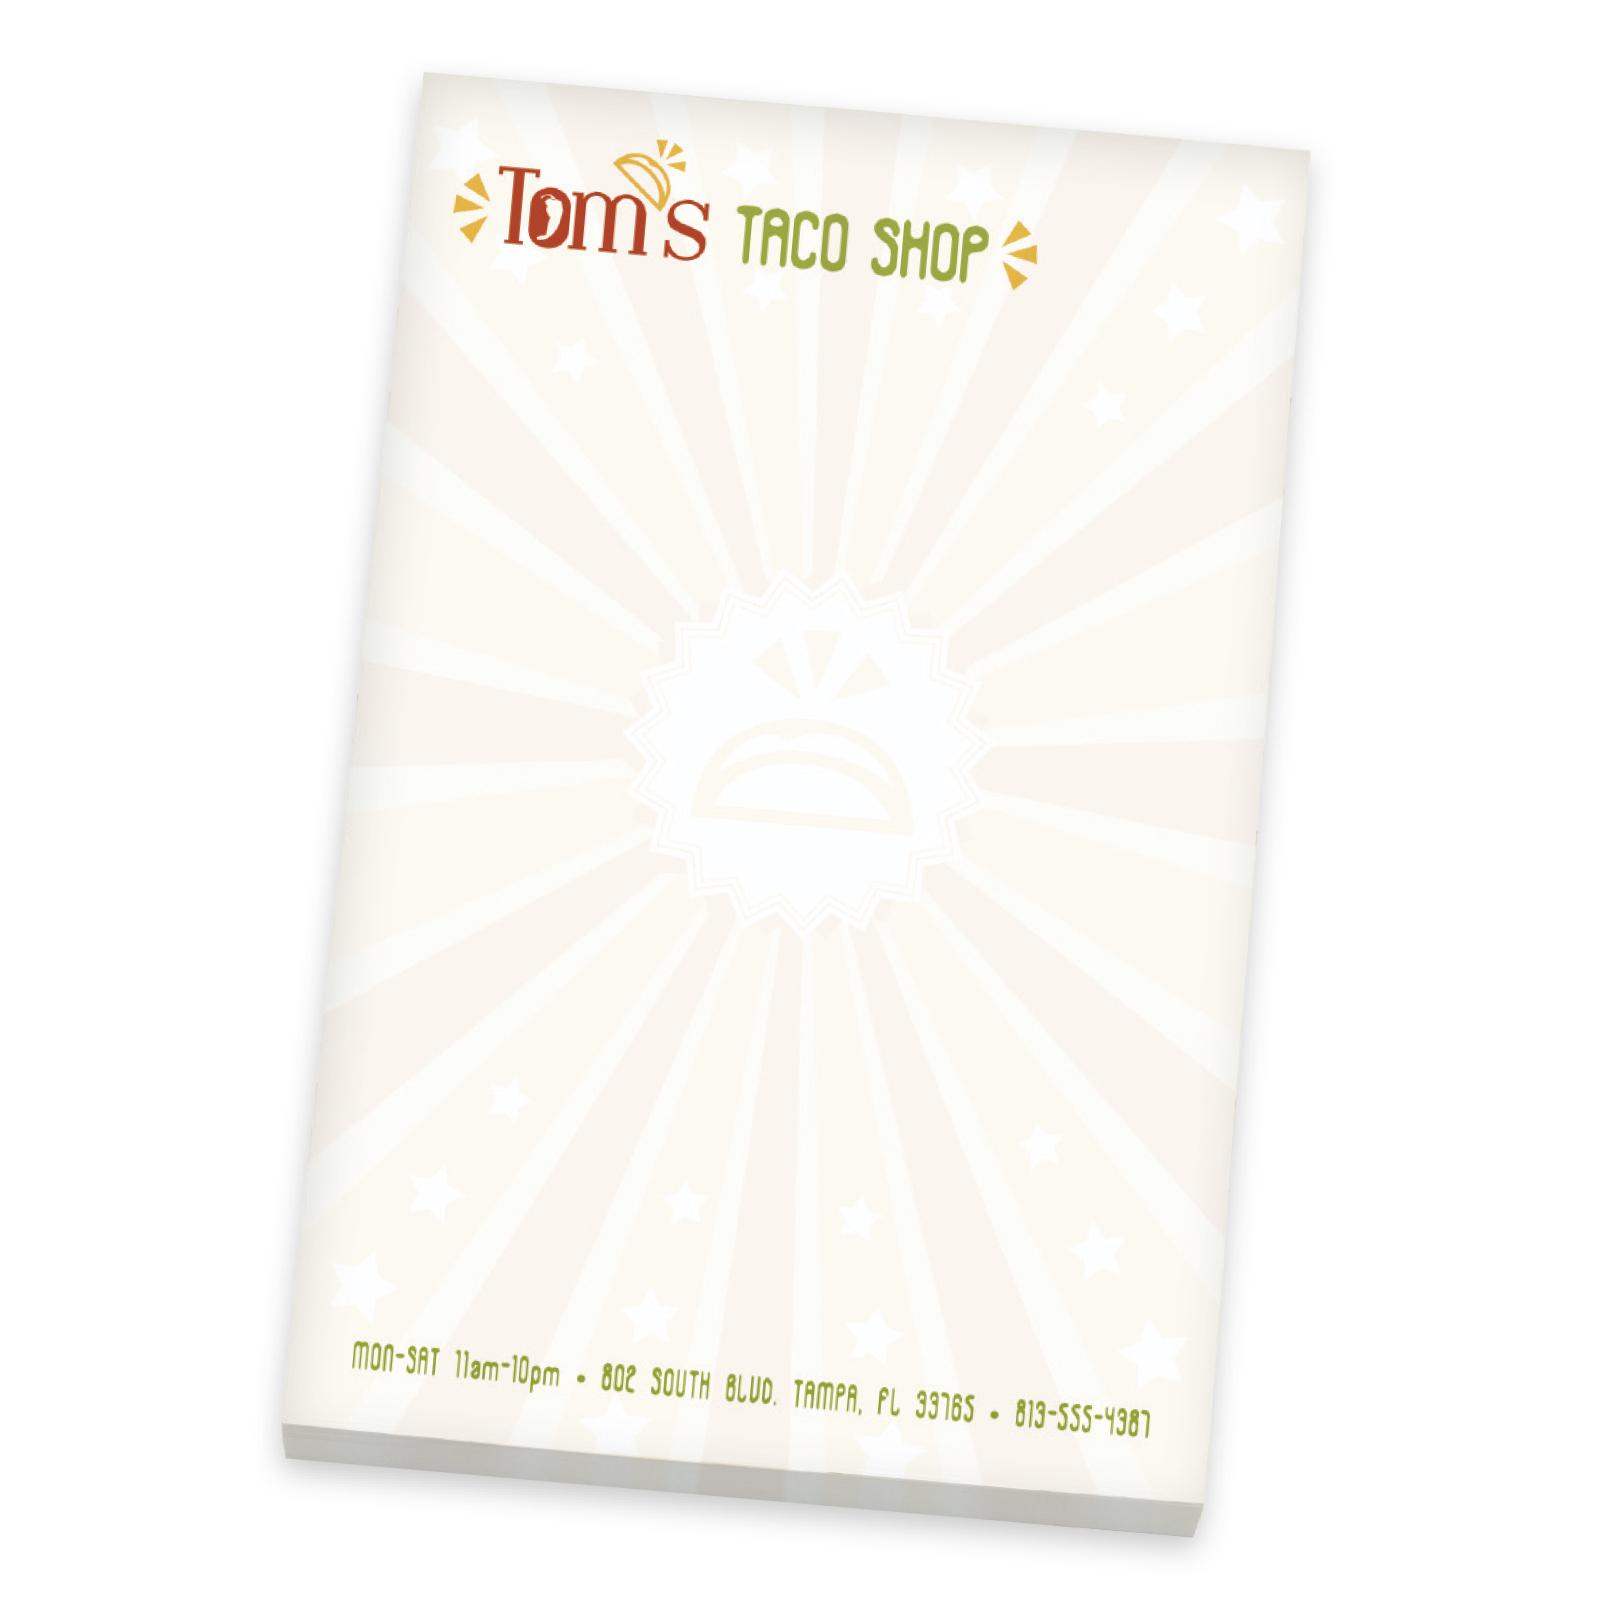 BIC 25 Sheet Non-Adhesive Scratch Pad (4